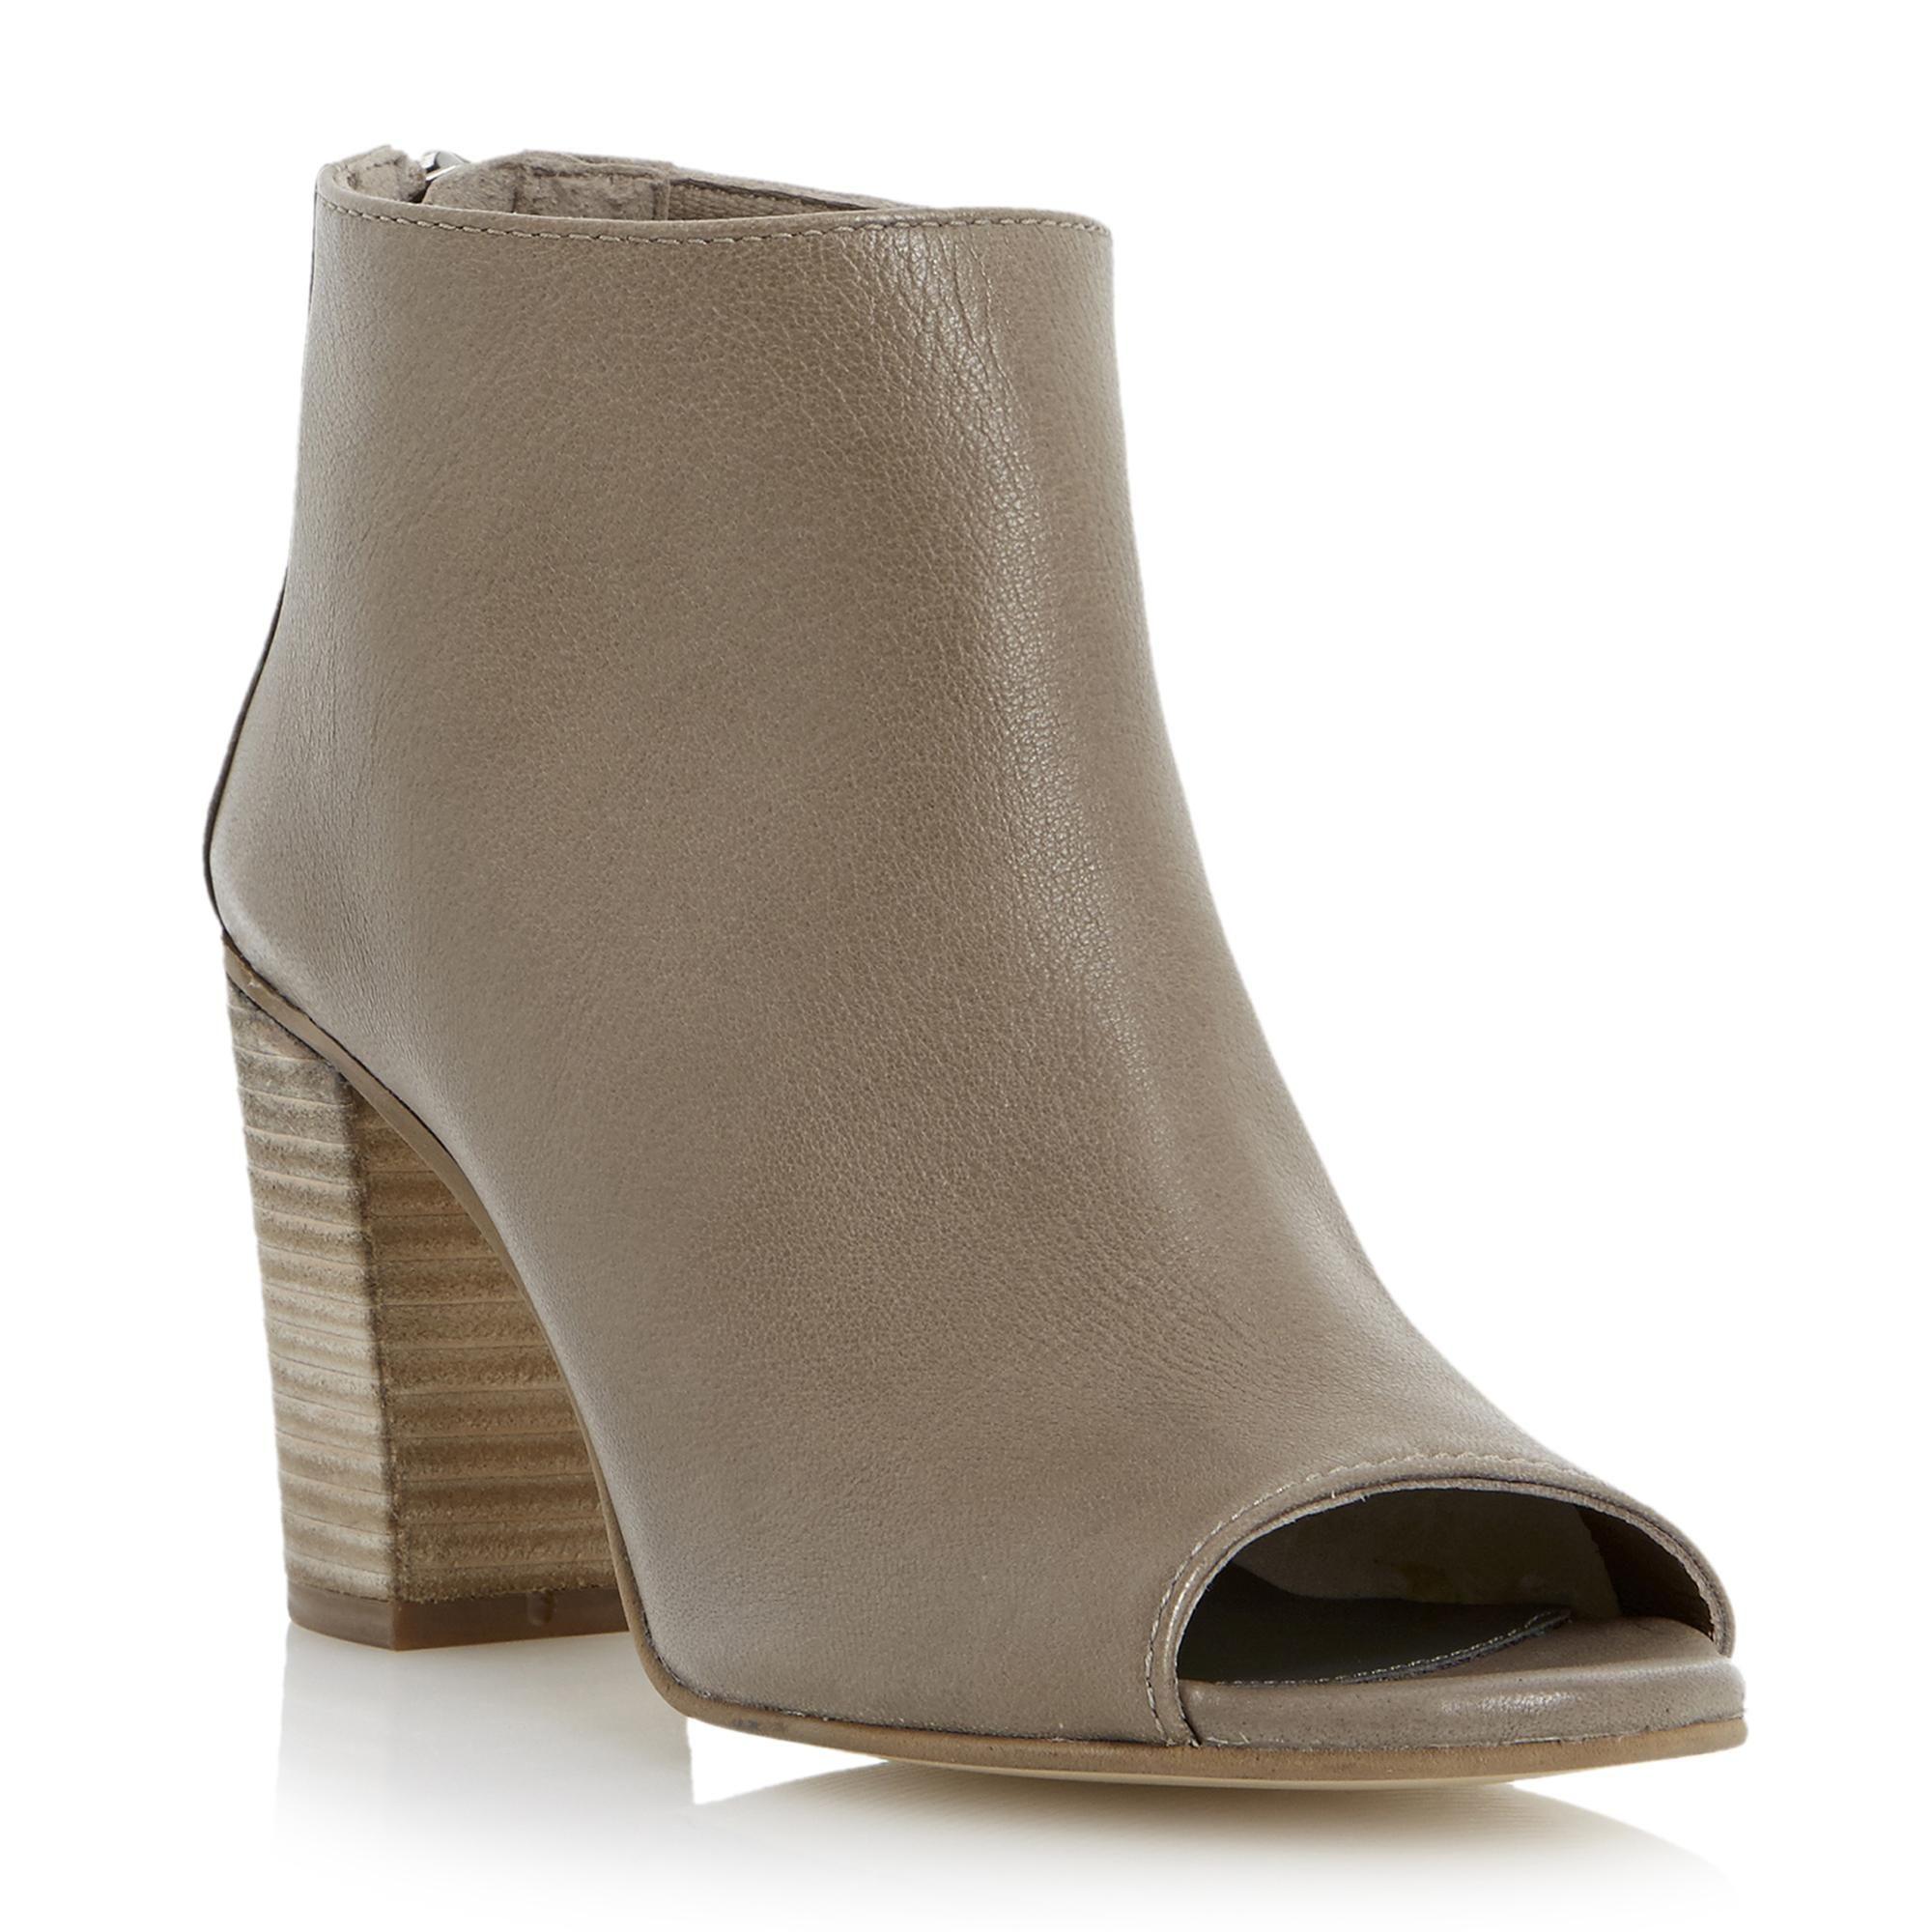 DUNE LADIES JOYFULL - Leather Peep Toe Ankle Boot - grey | Dune Shoes Online